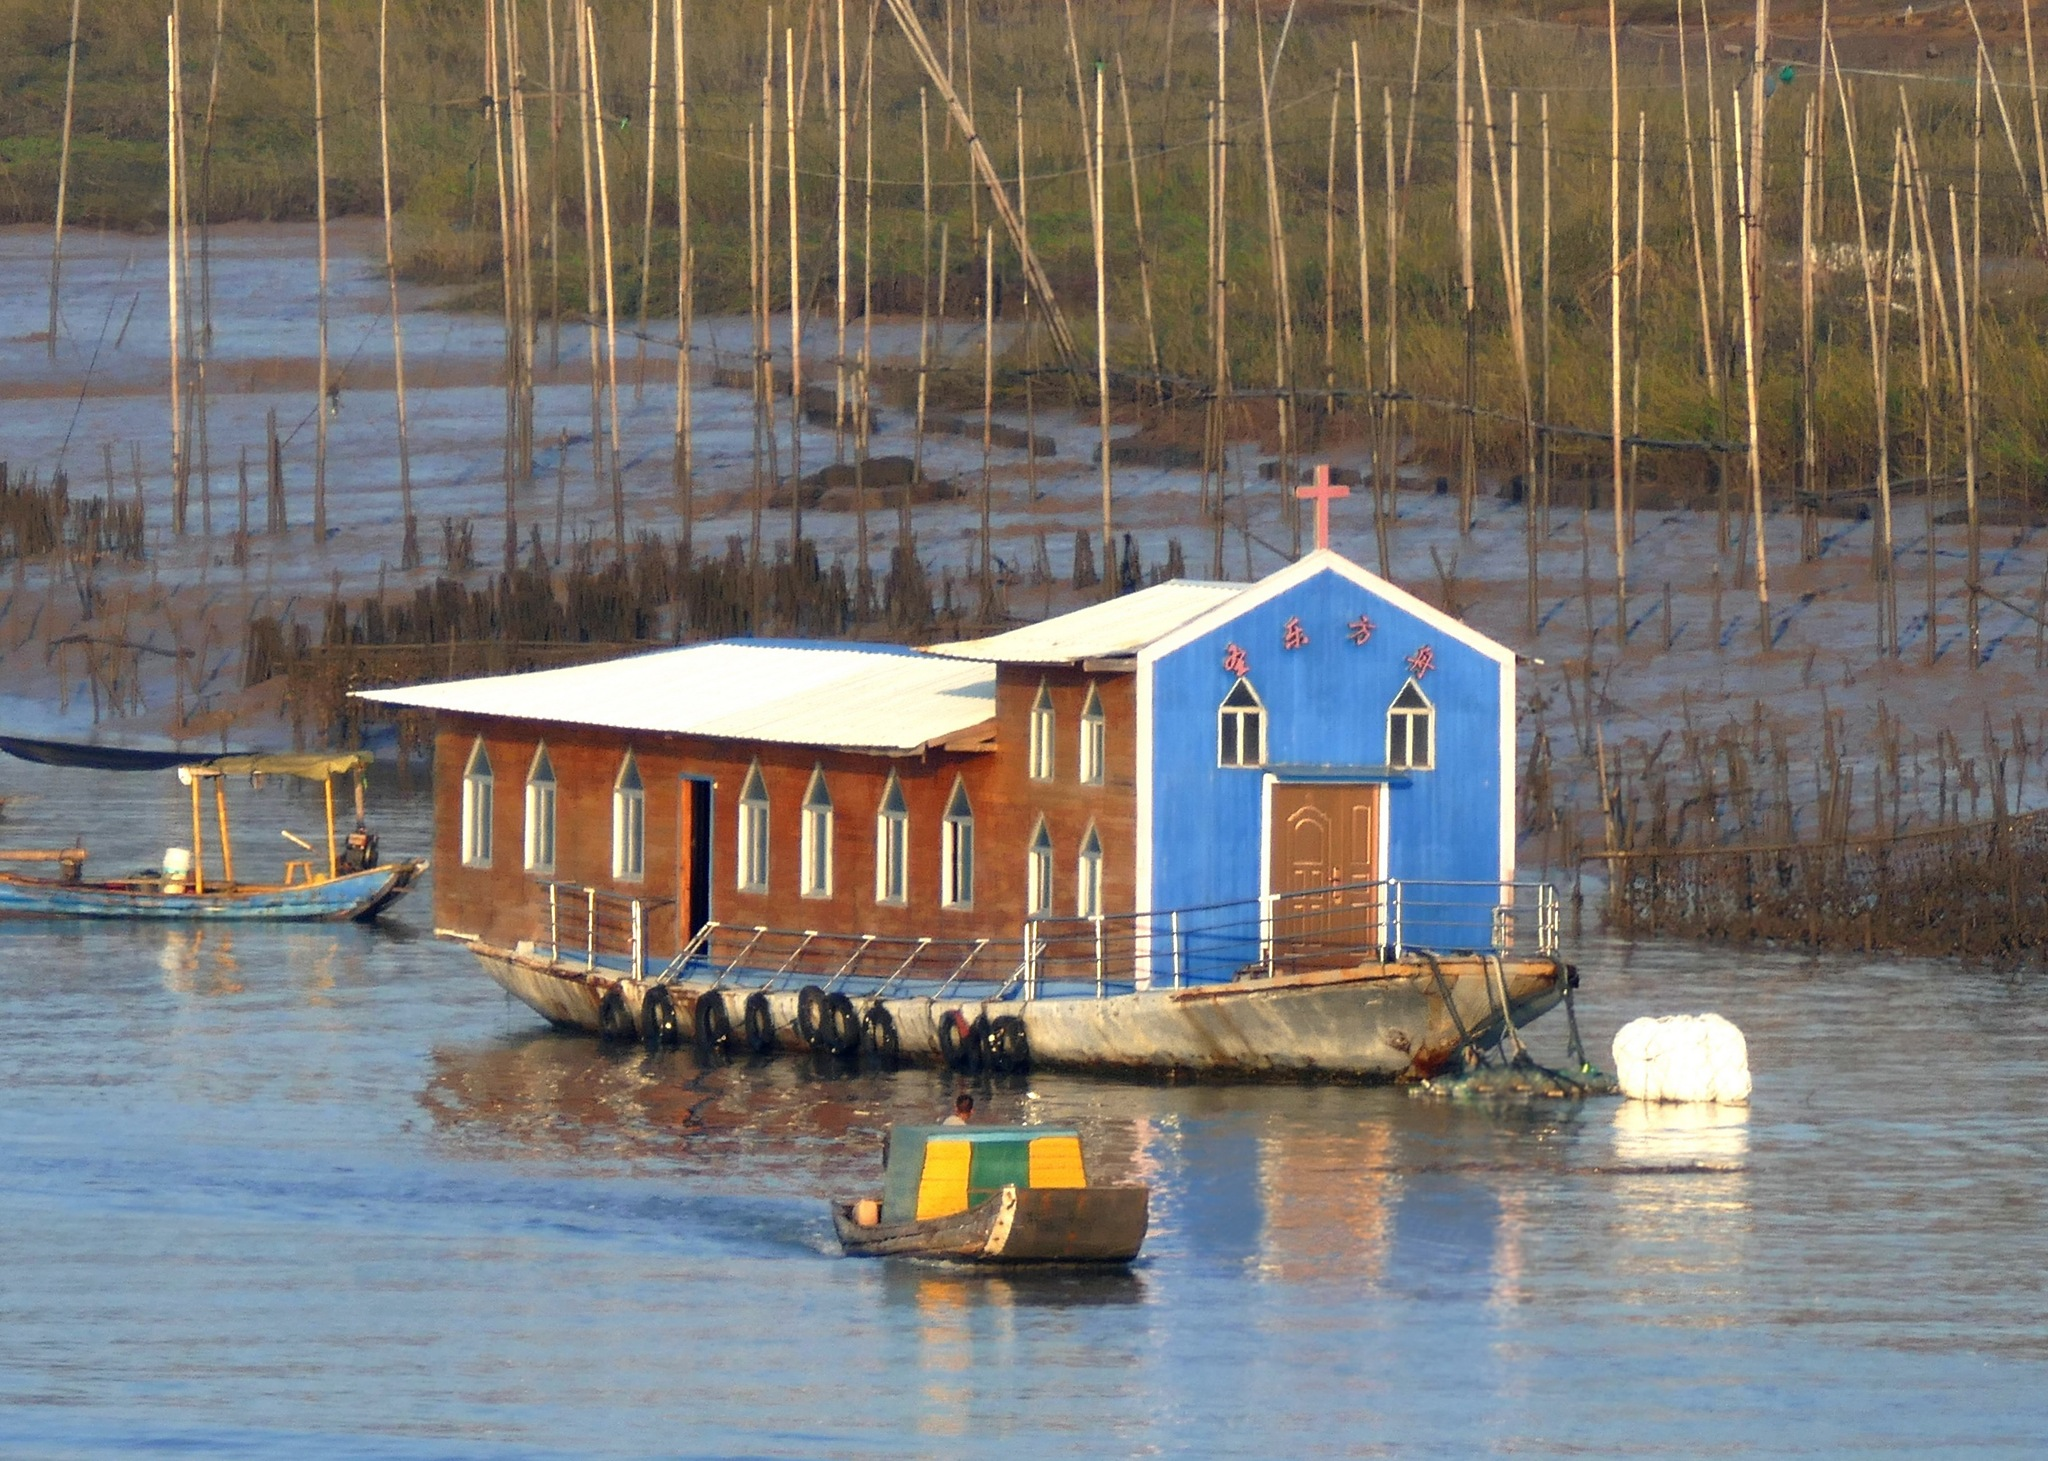 Fishing village, Xia Qing Shan-1 by pop88123